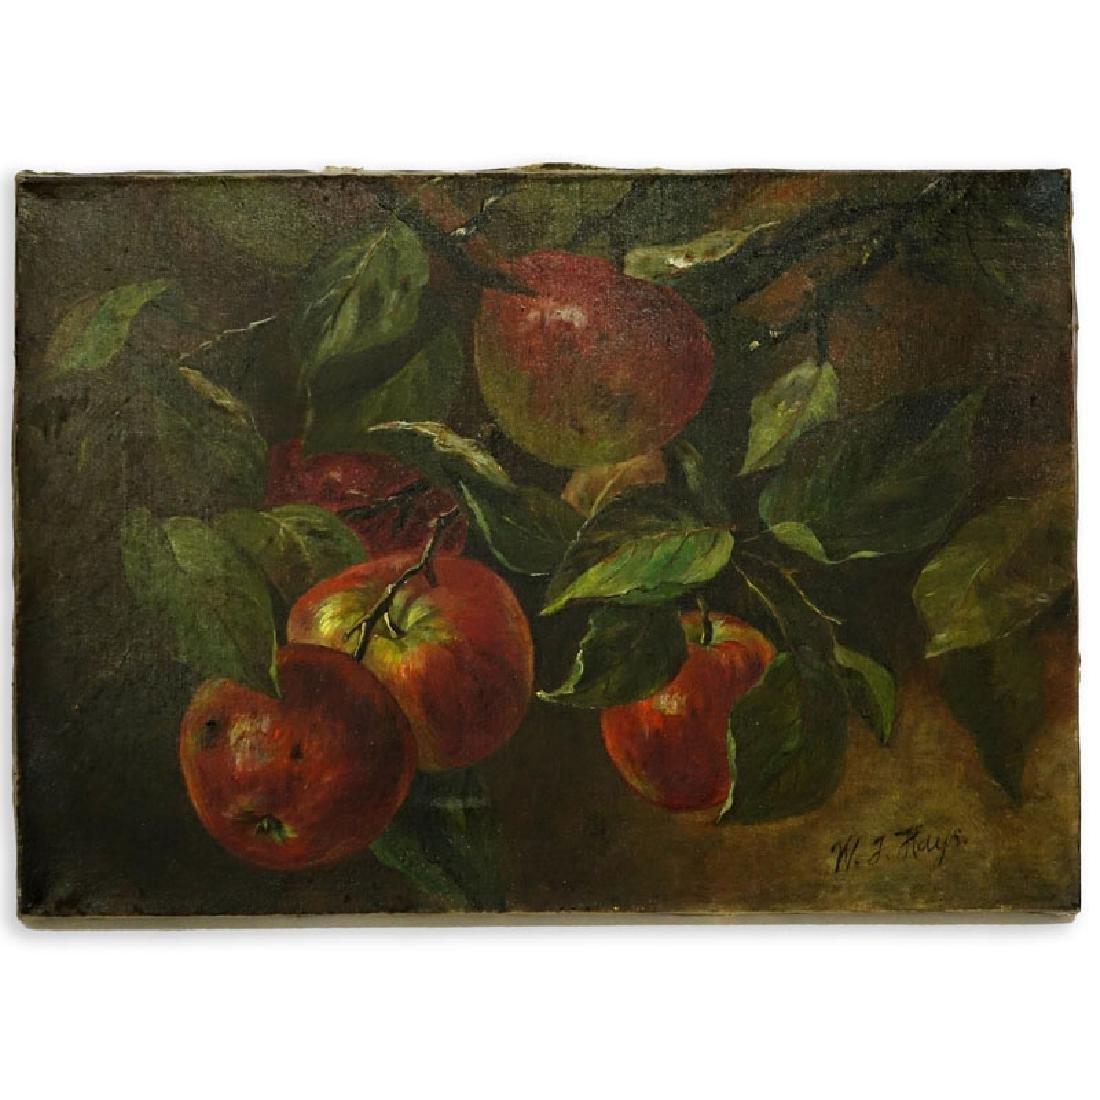 William Hays Sr., American (1830 - 1875) Oil on Canvas